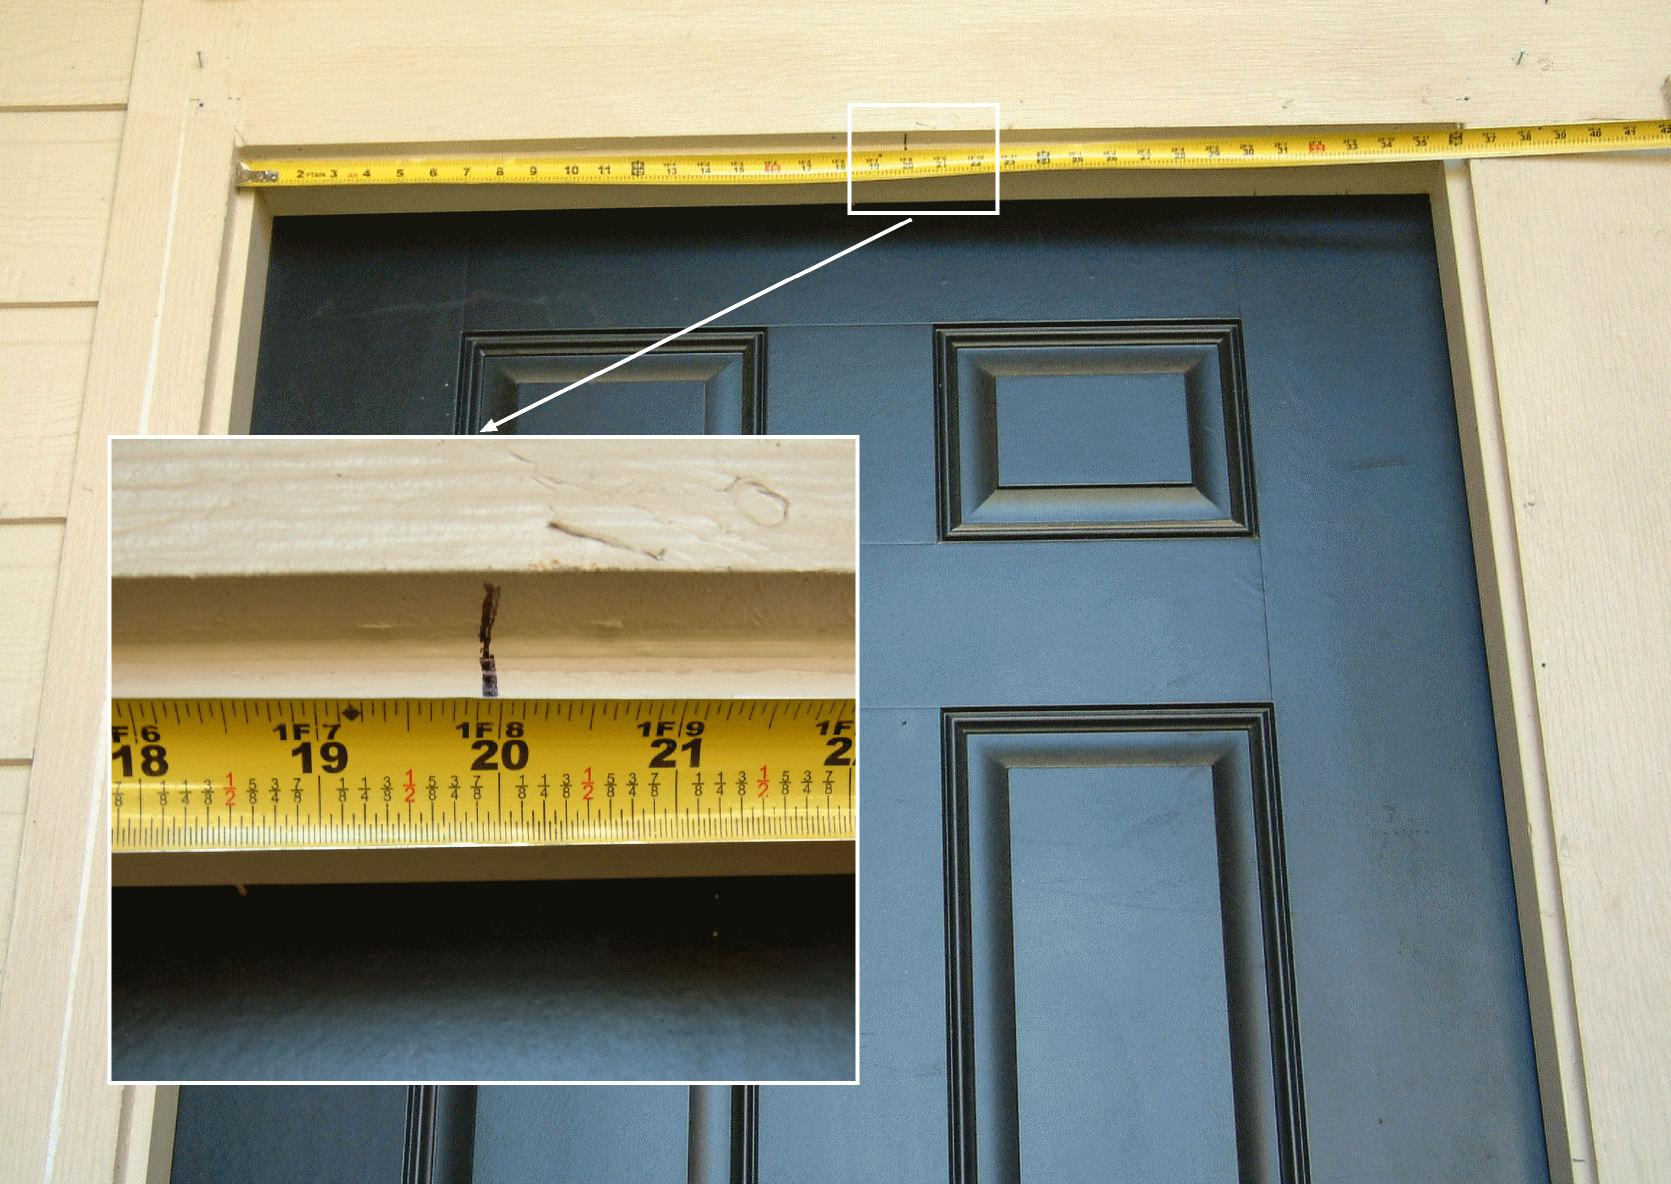 Old Measurement Instructions